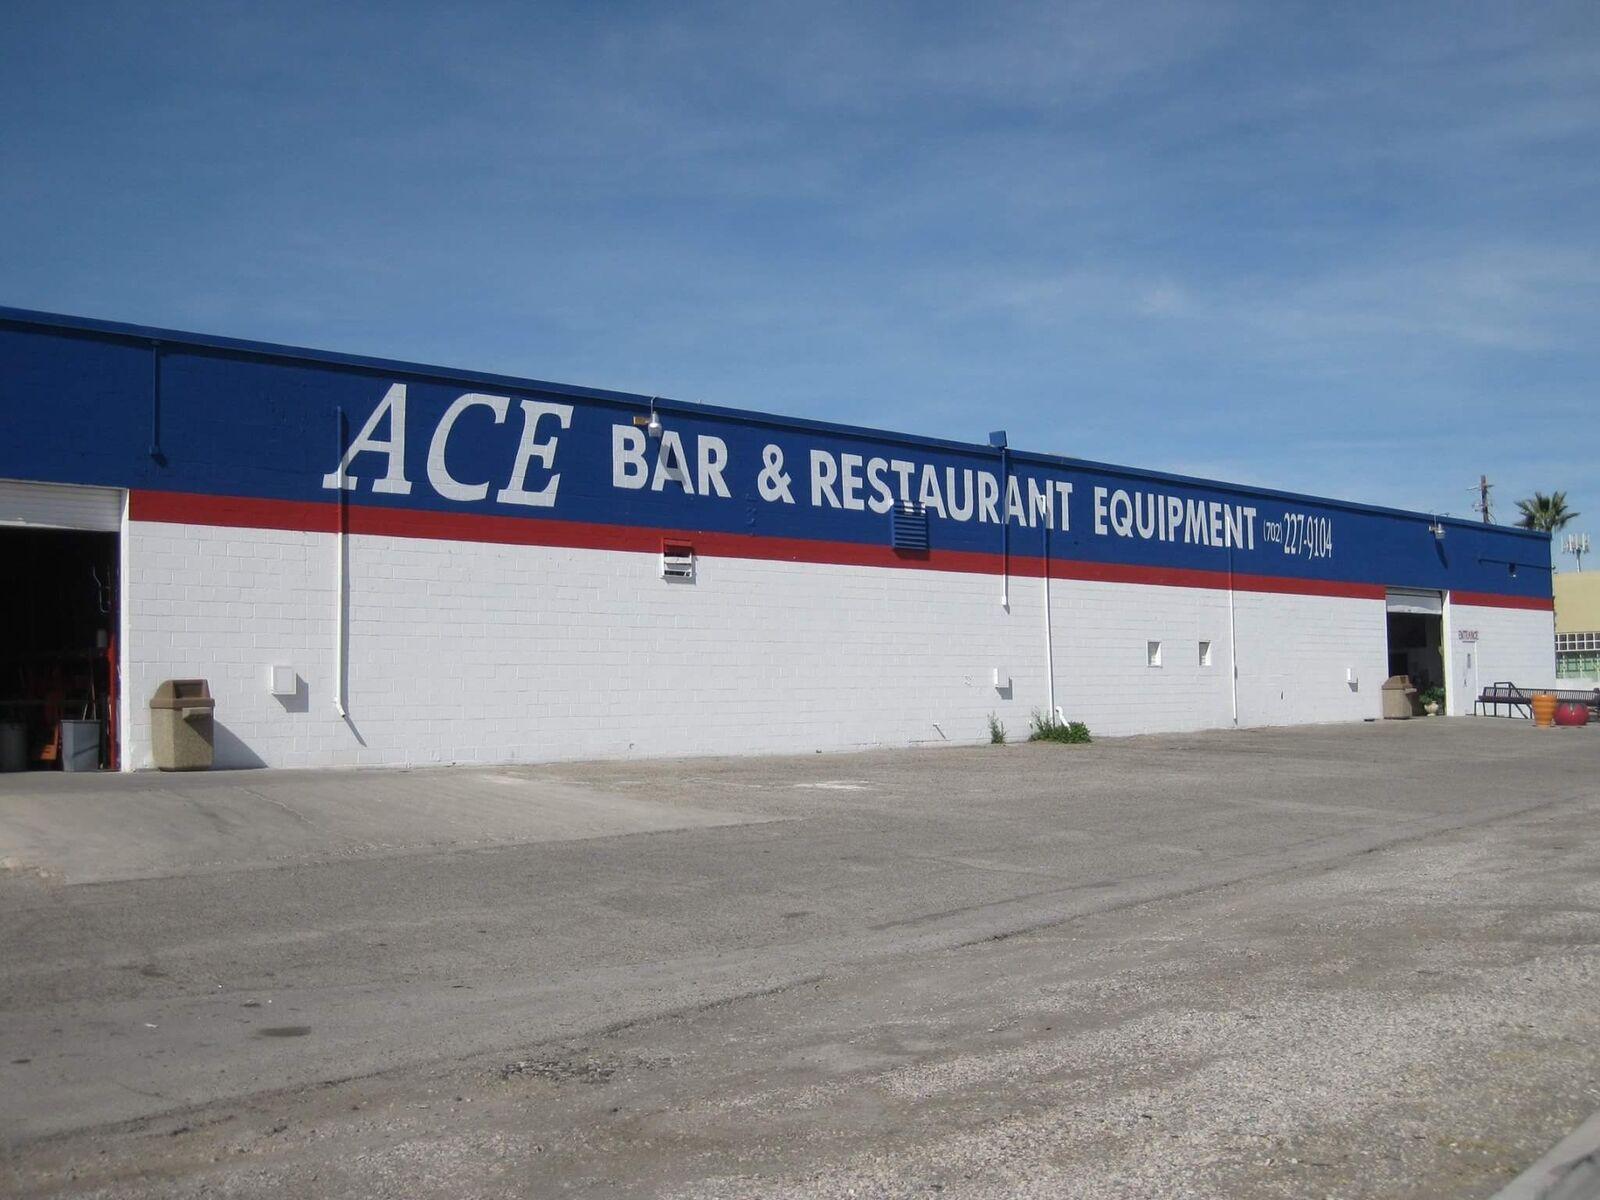 Ace Bar and Restaurant Equipment